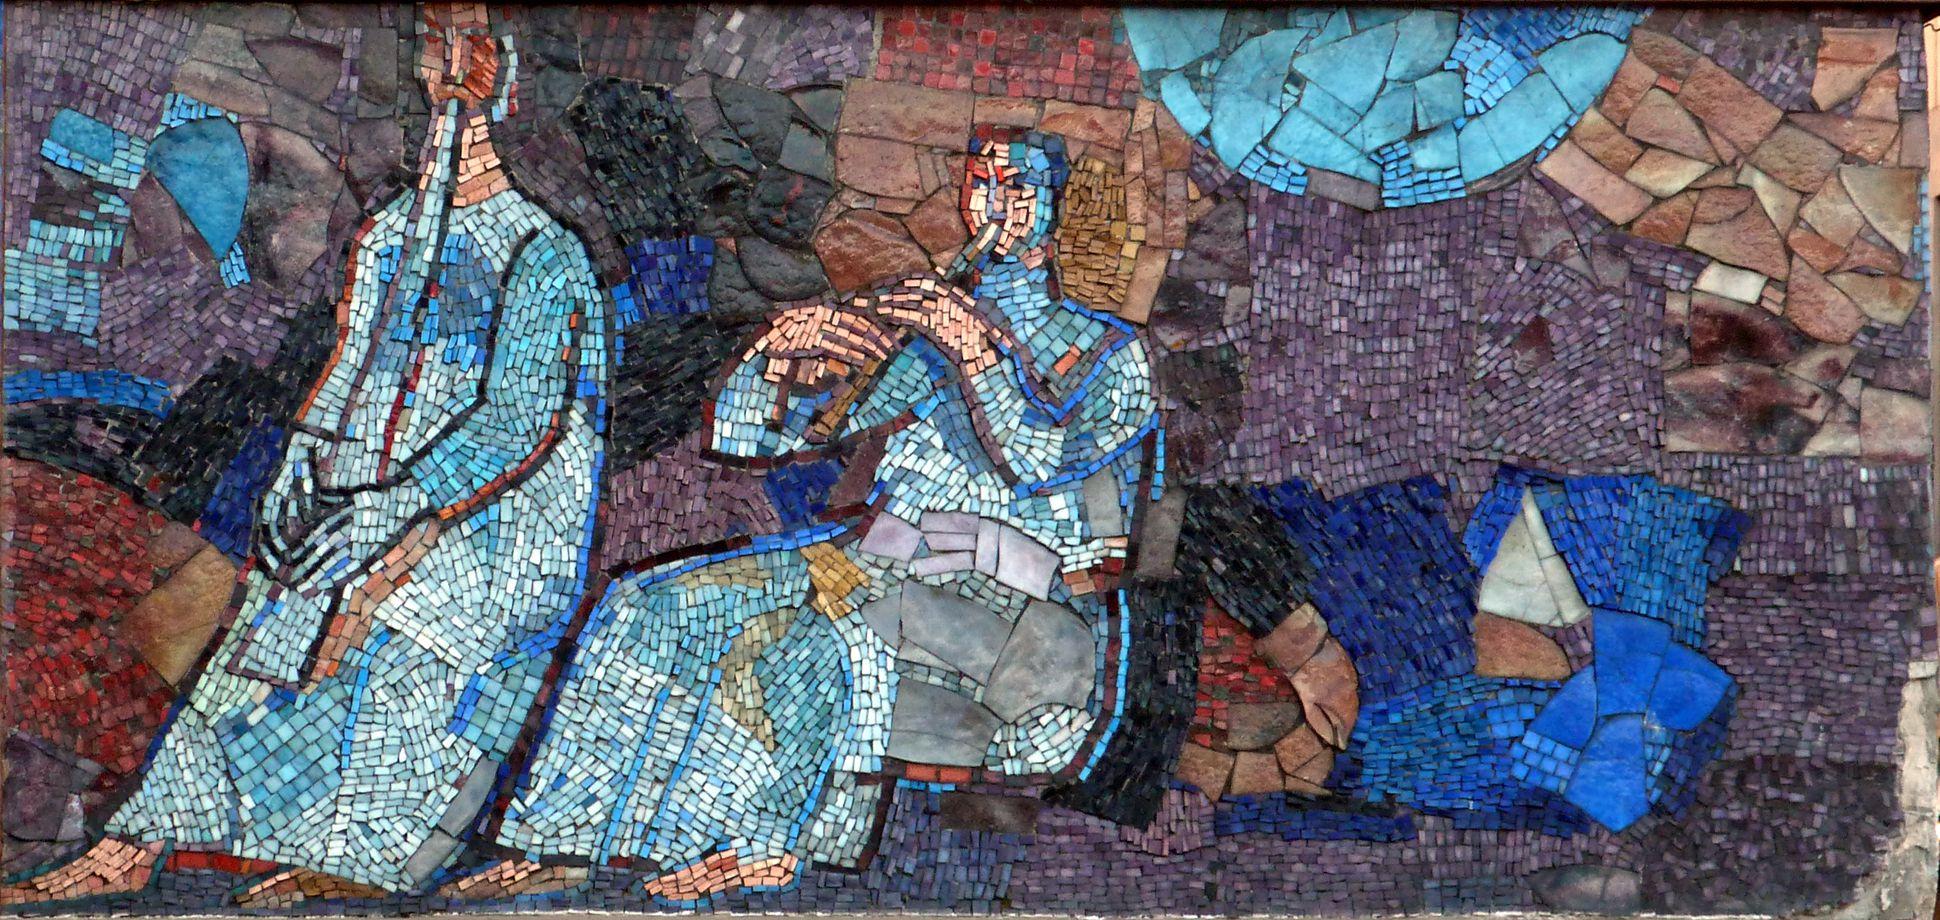 Mosaik am Hauptmarkt in Nürnberg Musikanten